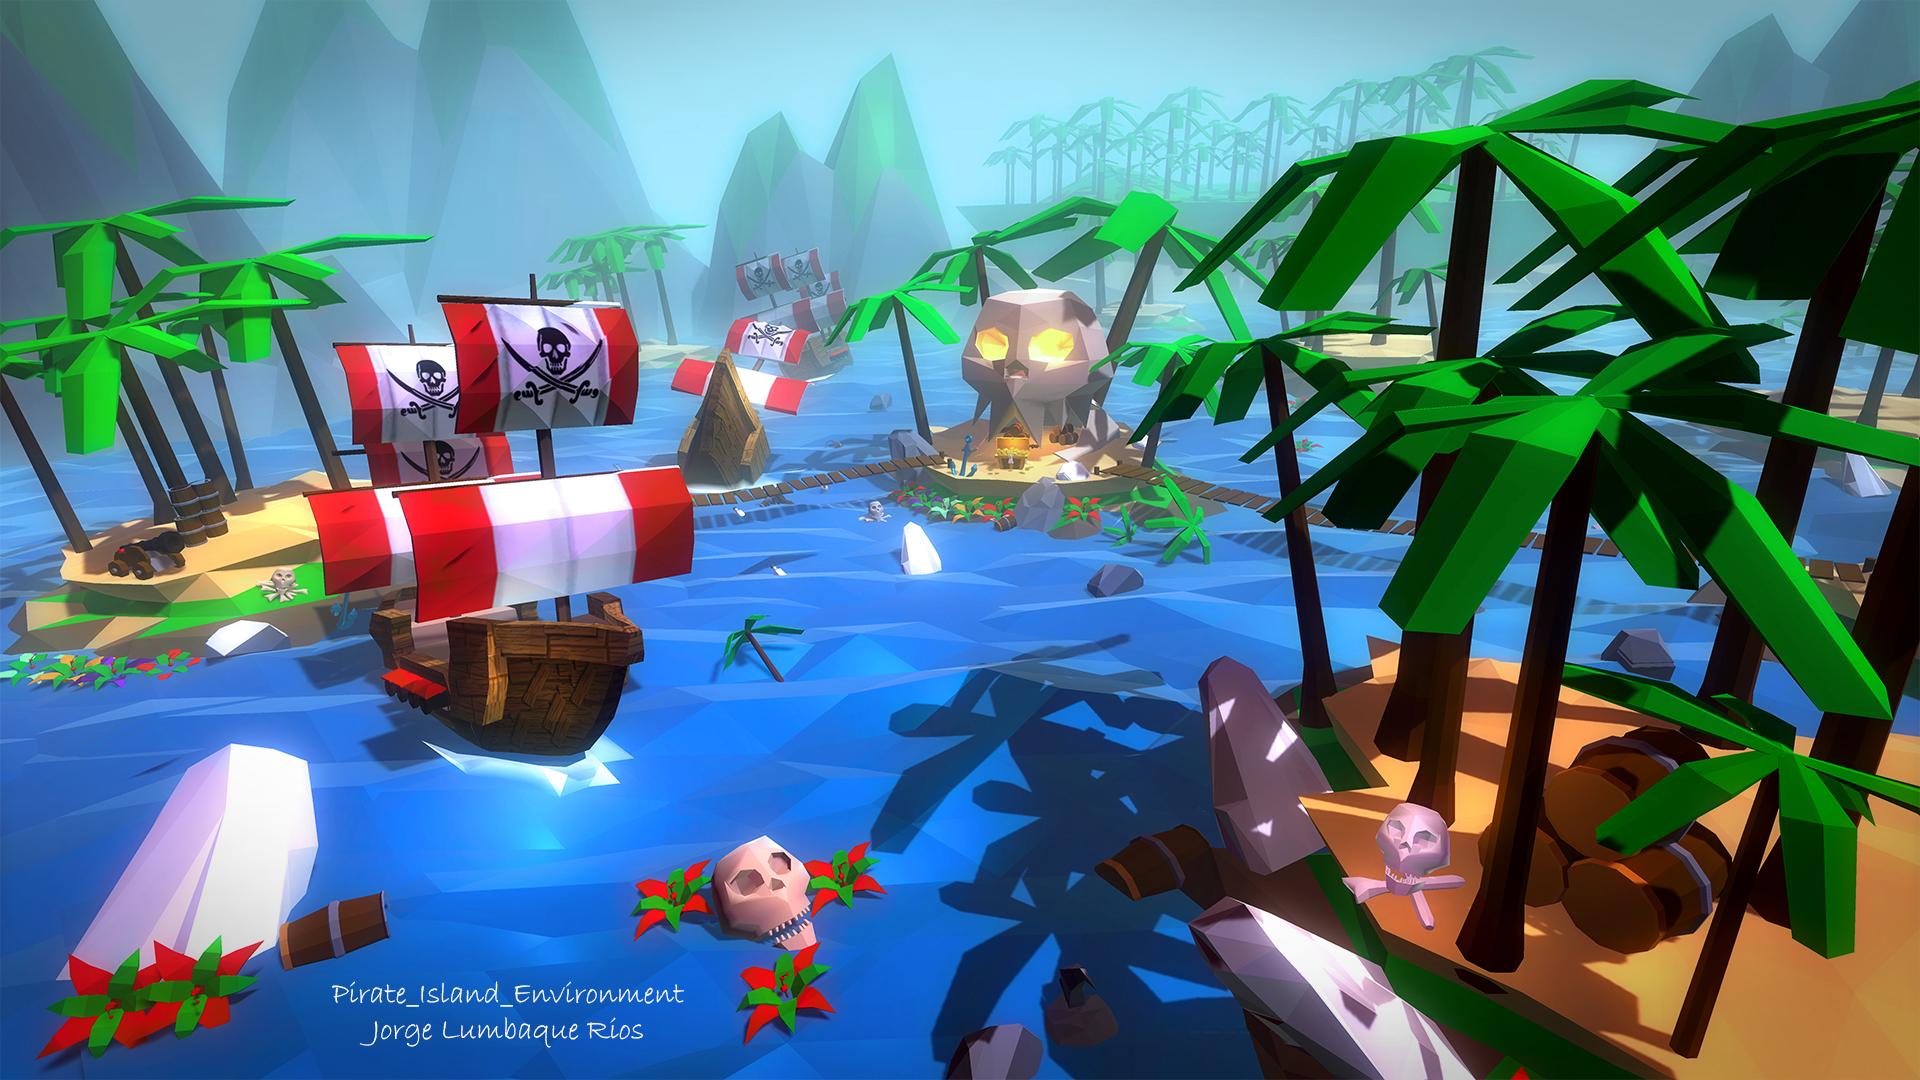 Pirate Island Environment